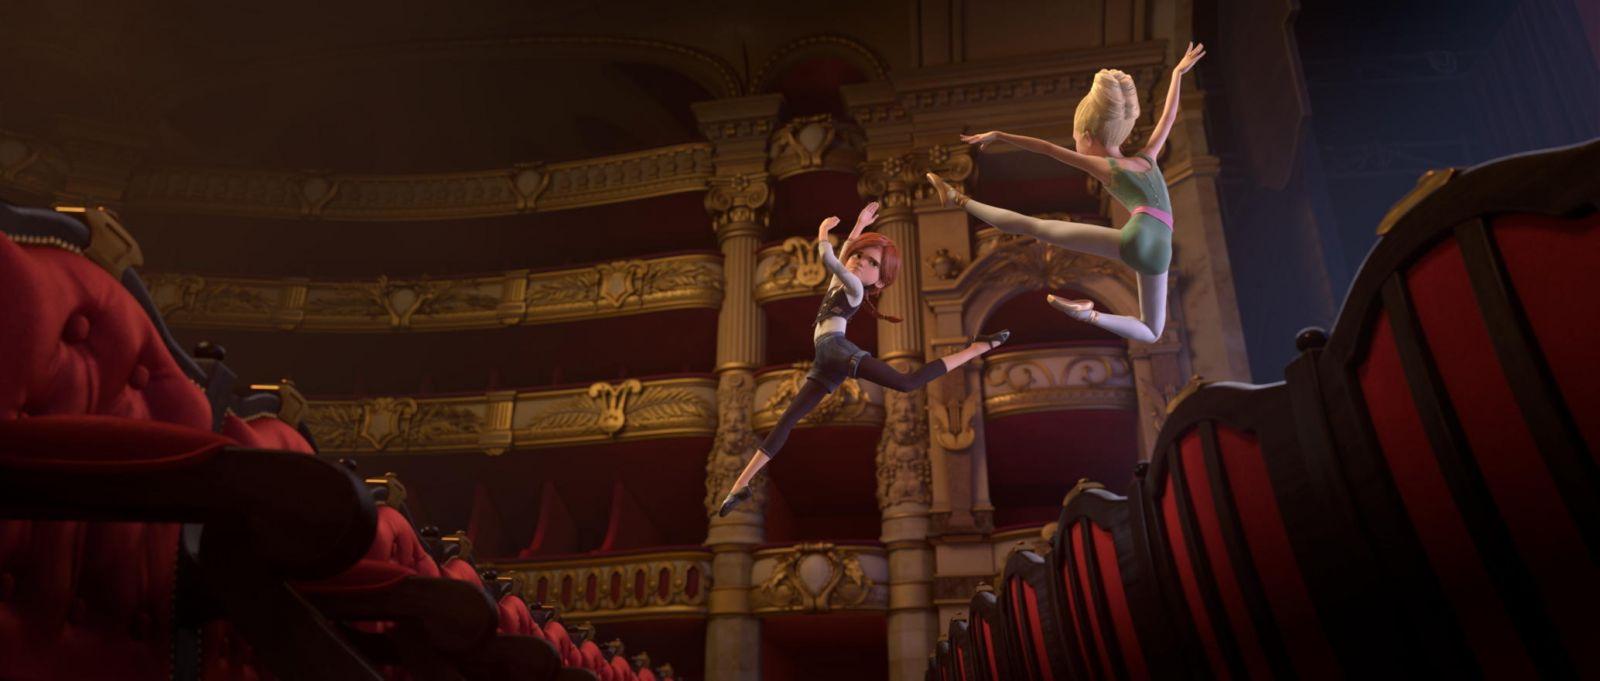 "A frame from the cartoon ""The Ballerina"""